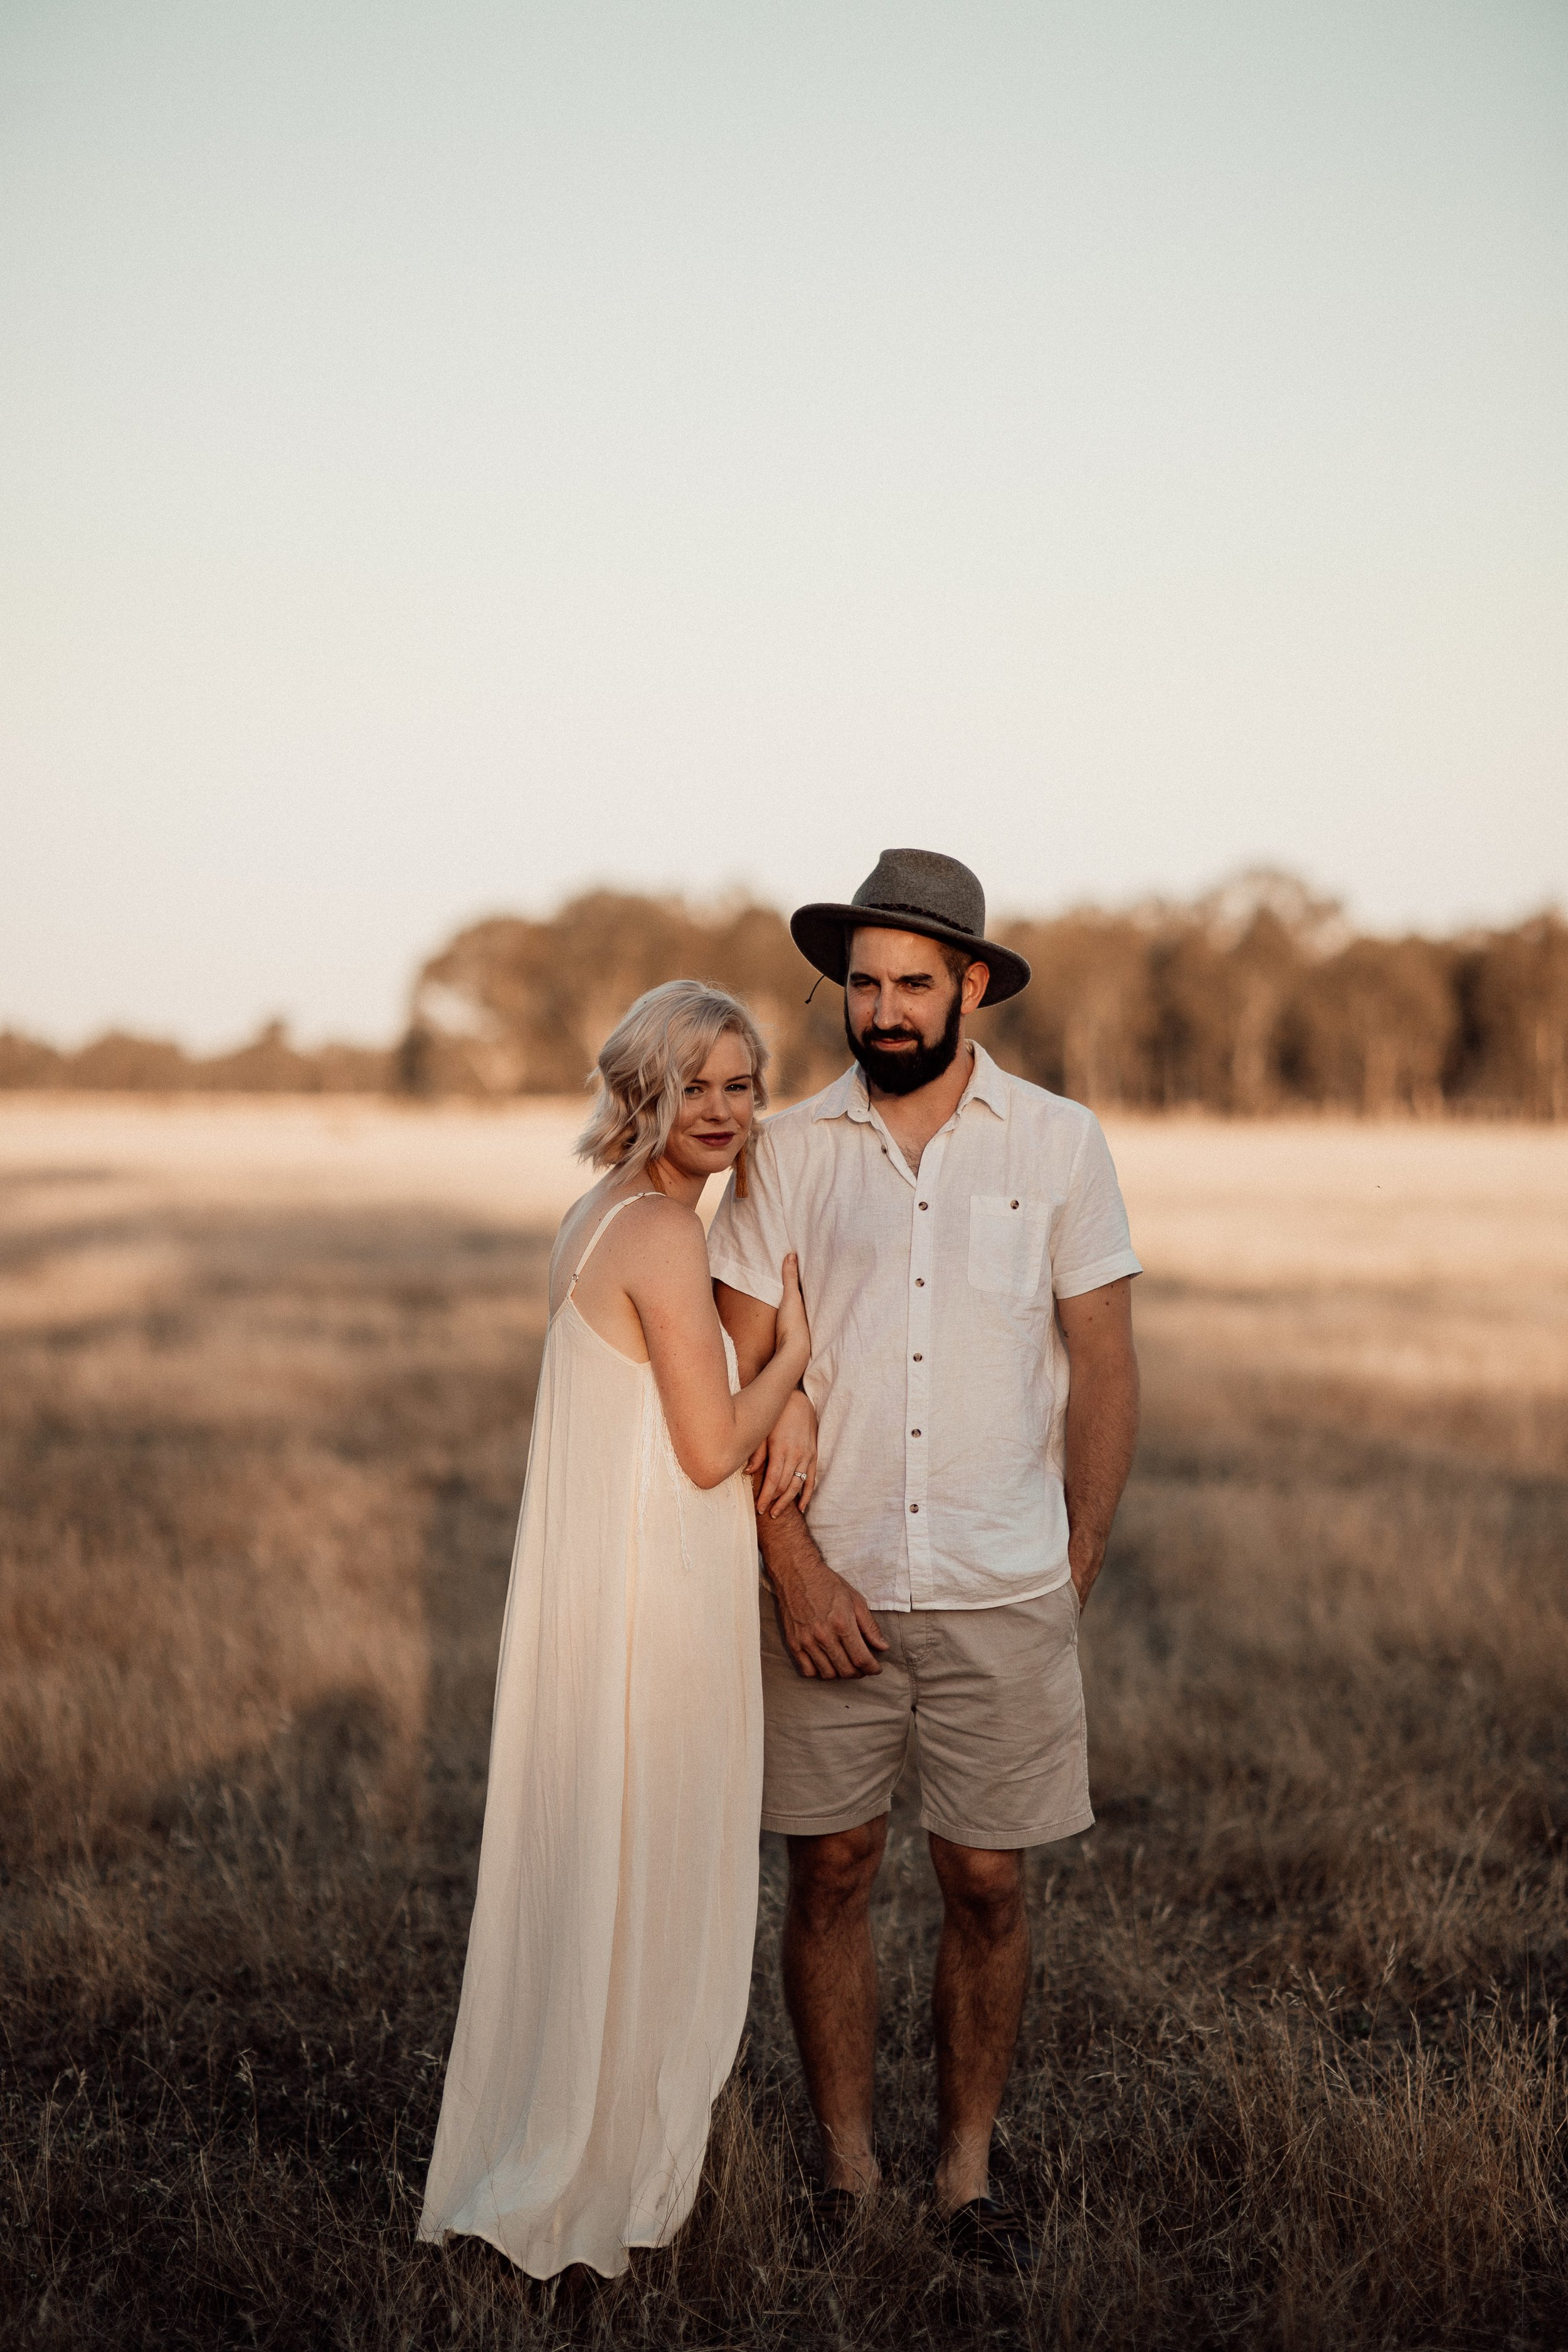 mickalathomas_puremacphotography_weddingphotographer_couplephotographer_Sheppartonphotographer_1633.jpg